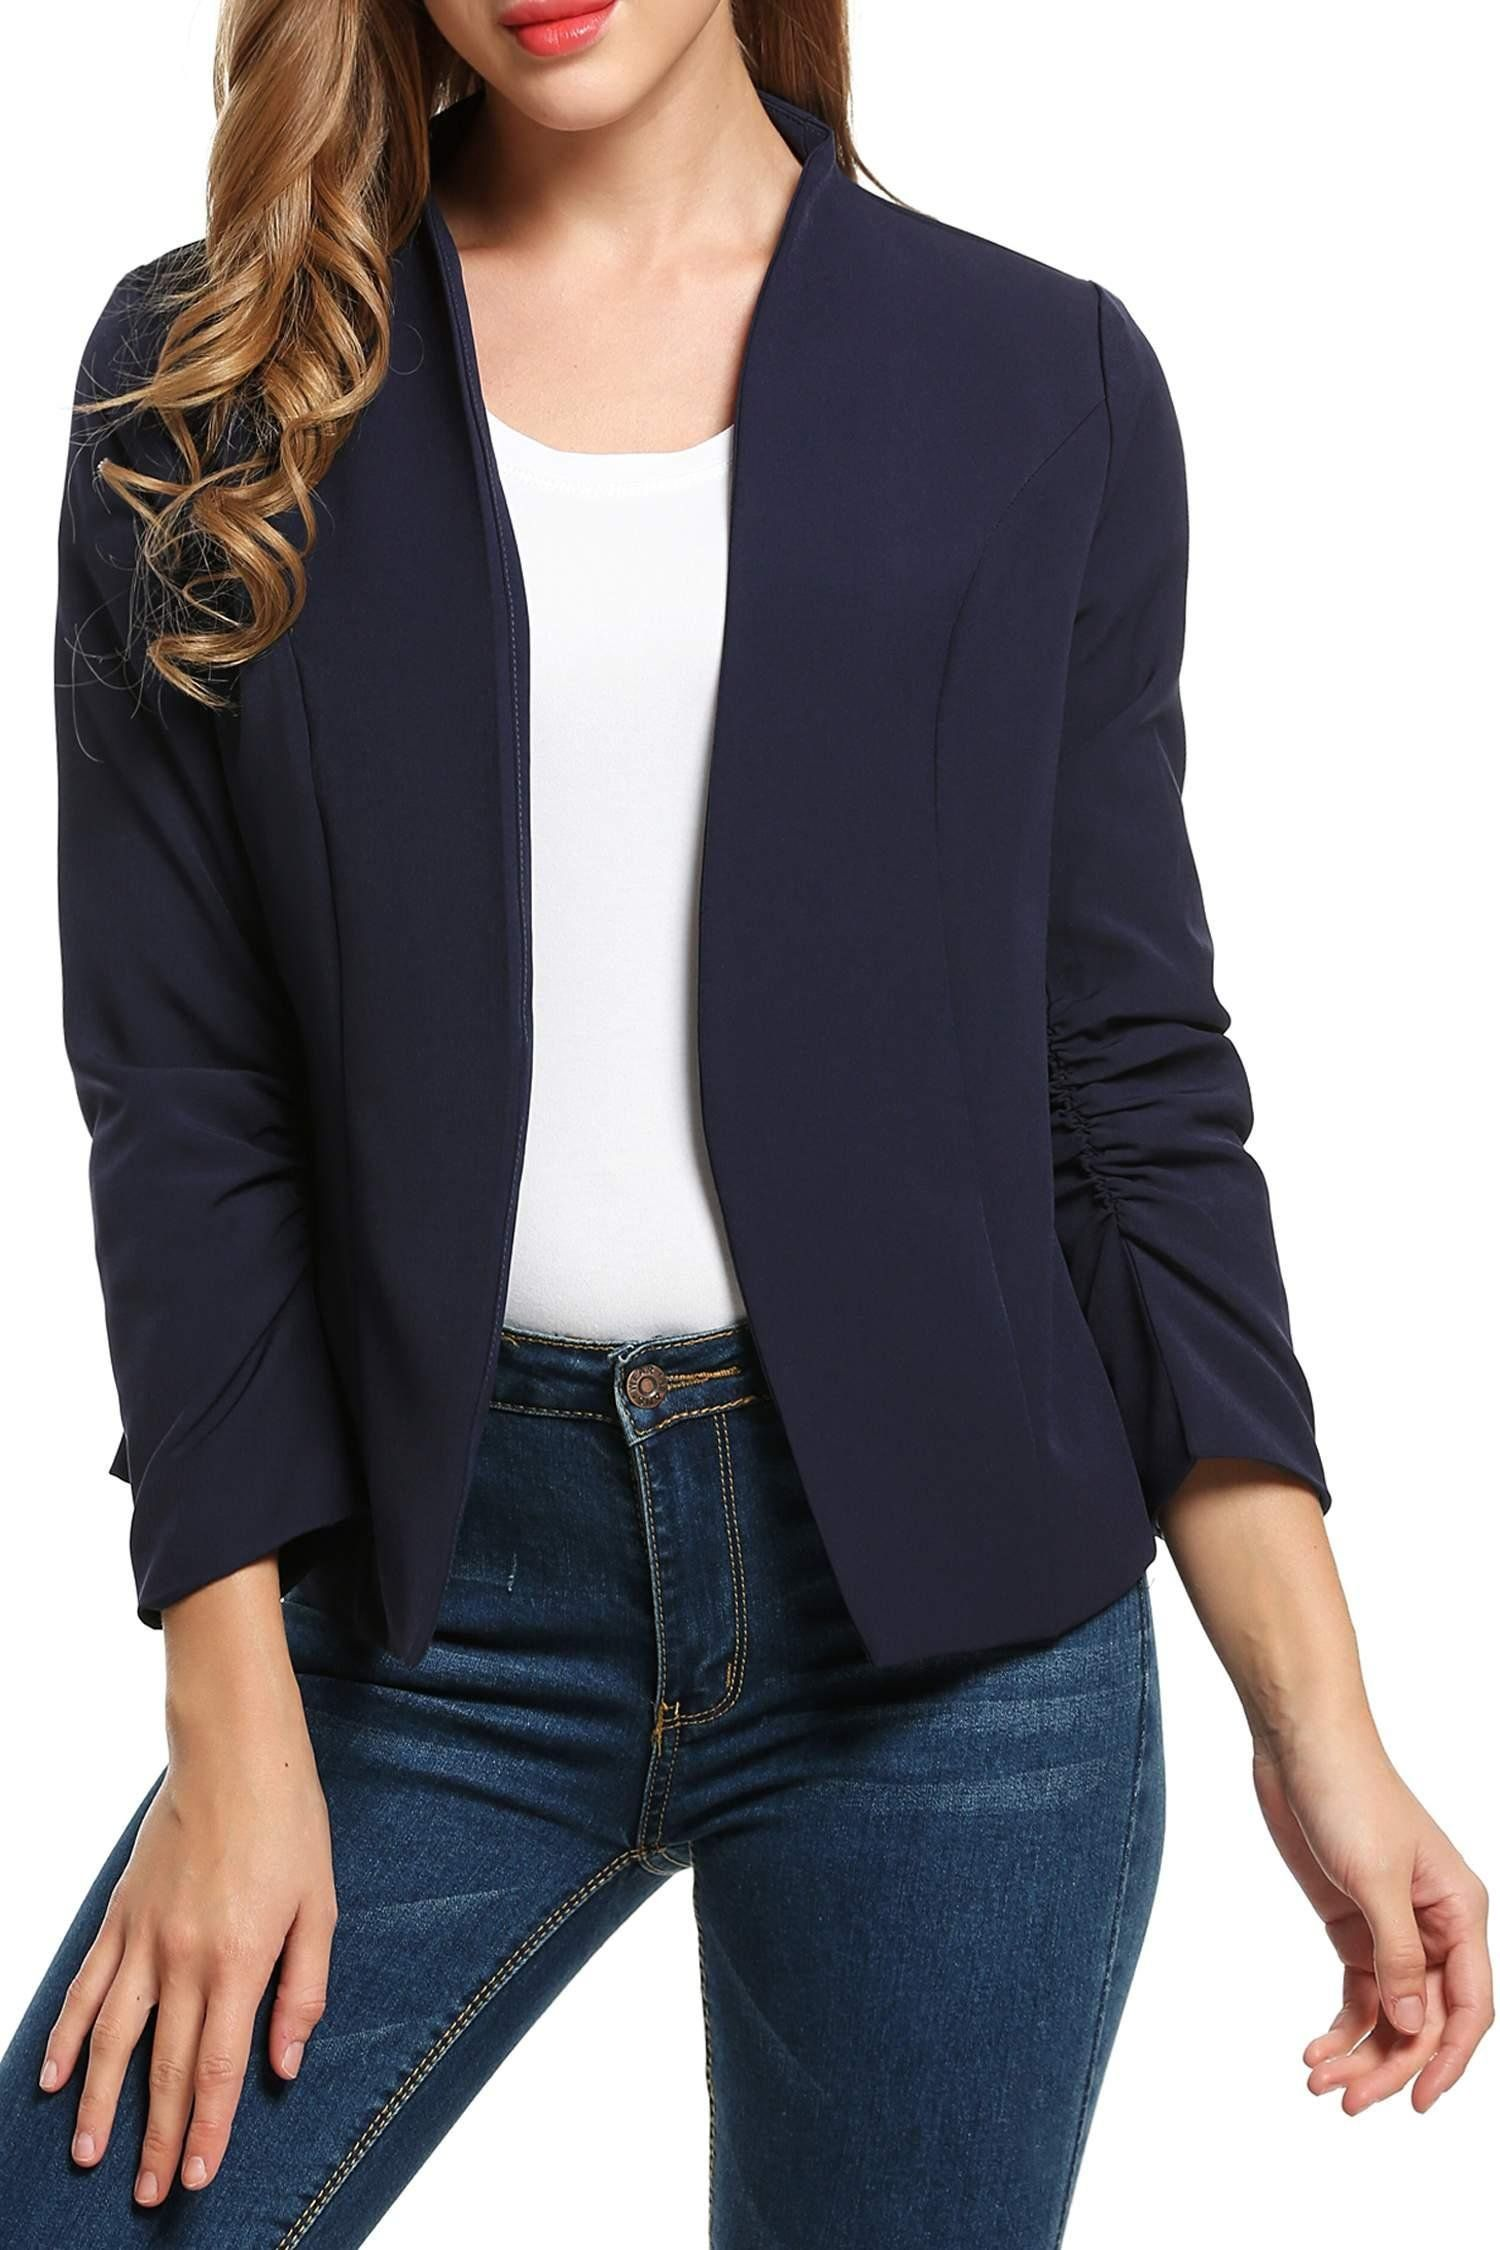 cf55701dcd Beyove Women s Cotton Long Sleeve Slim Short Blazer Suit Jacket Work Office Open  Front Cardigan Blazer Navy Blue XXL